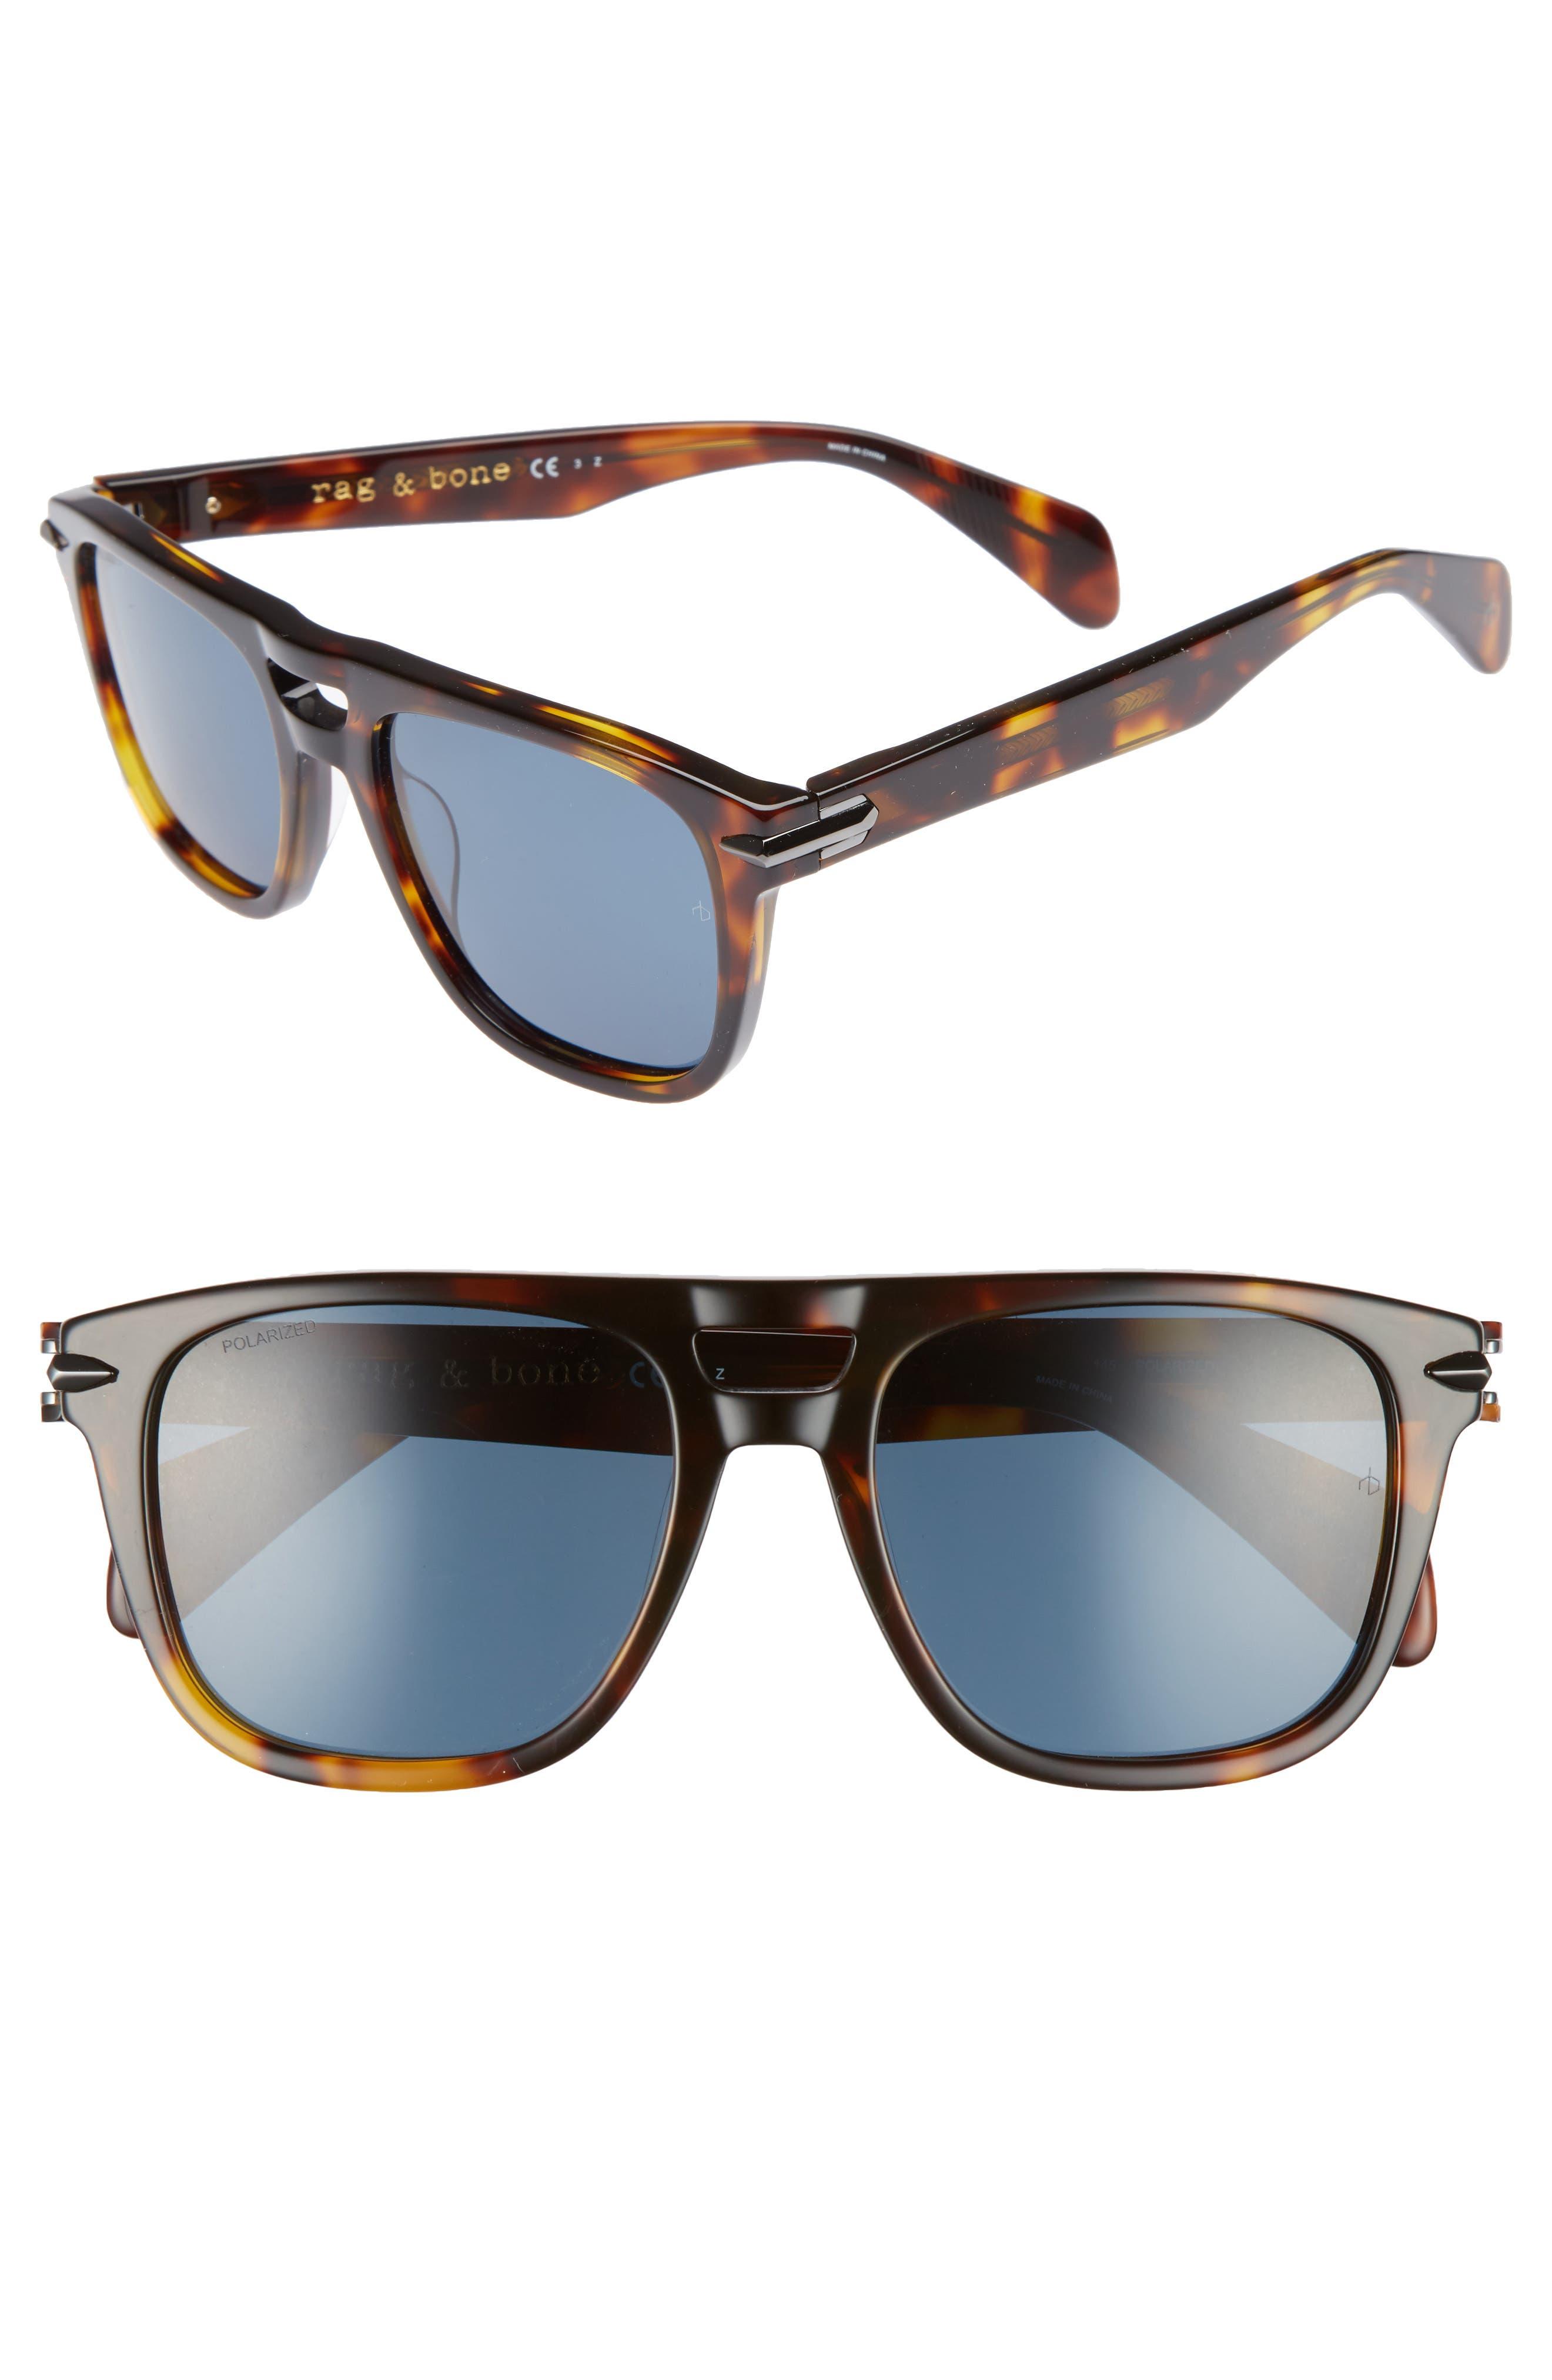 1a6327838 Rag & Bone Men's Square Tortoiseshell Acetate Navigator Sunglasses In Dark  Havana Polar